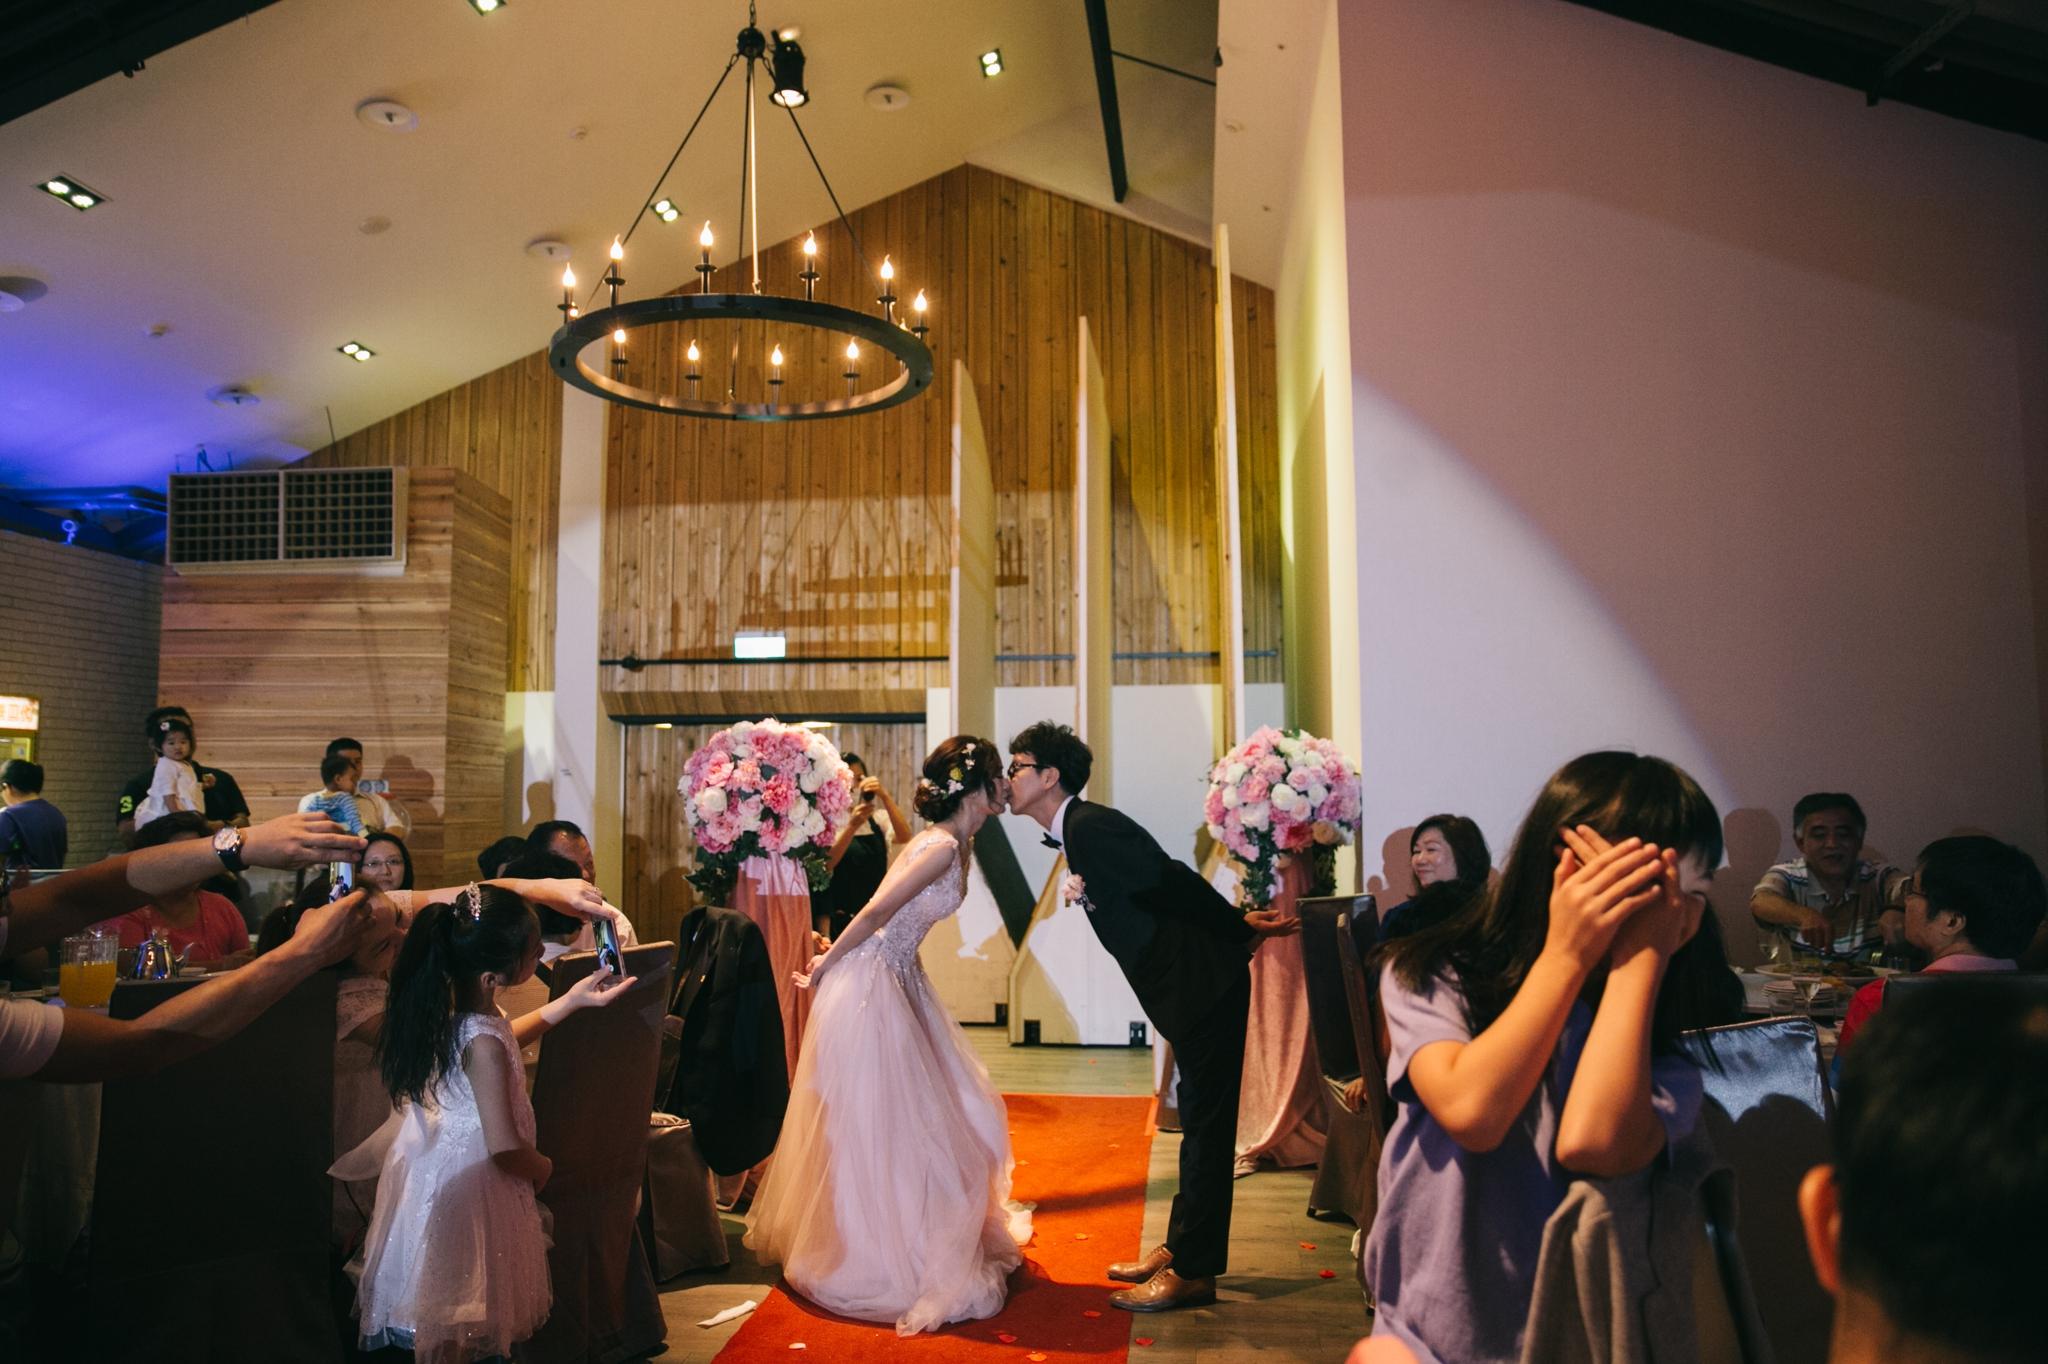 Tina+Nash-wedding-台北婚禮迎娶晚宴-新莊終身大事-136.jpg